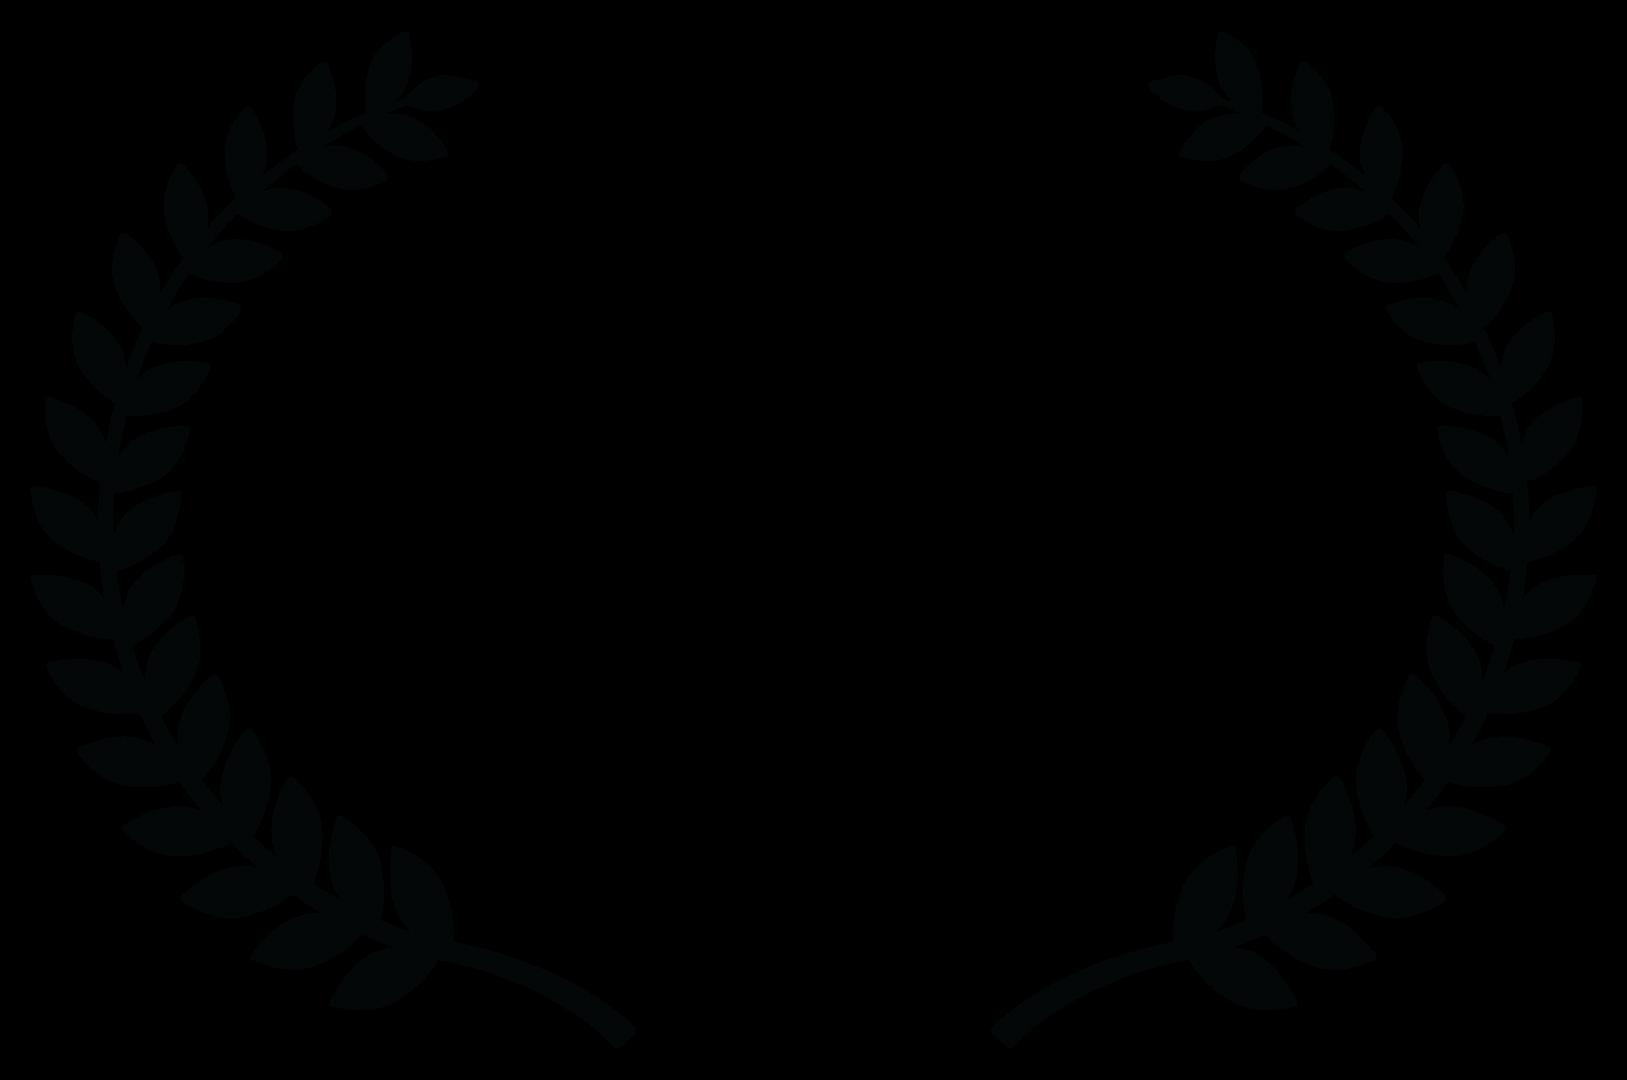 FINALIST-8THANNUALKATRAFILMSERIESGRANDFI